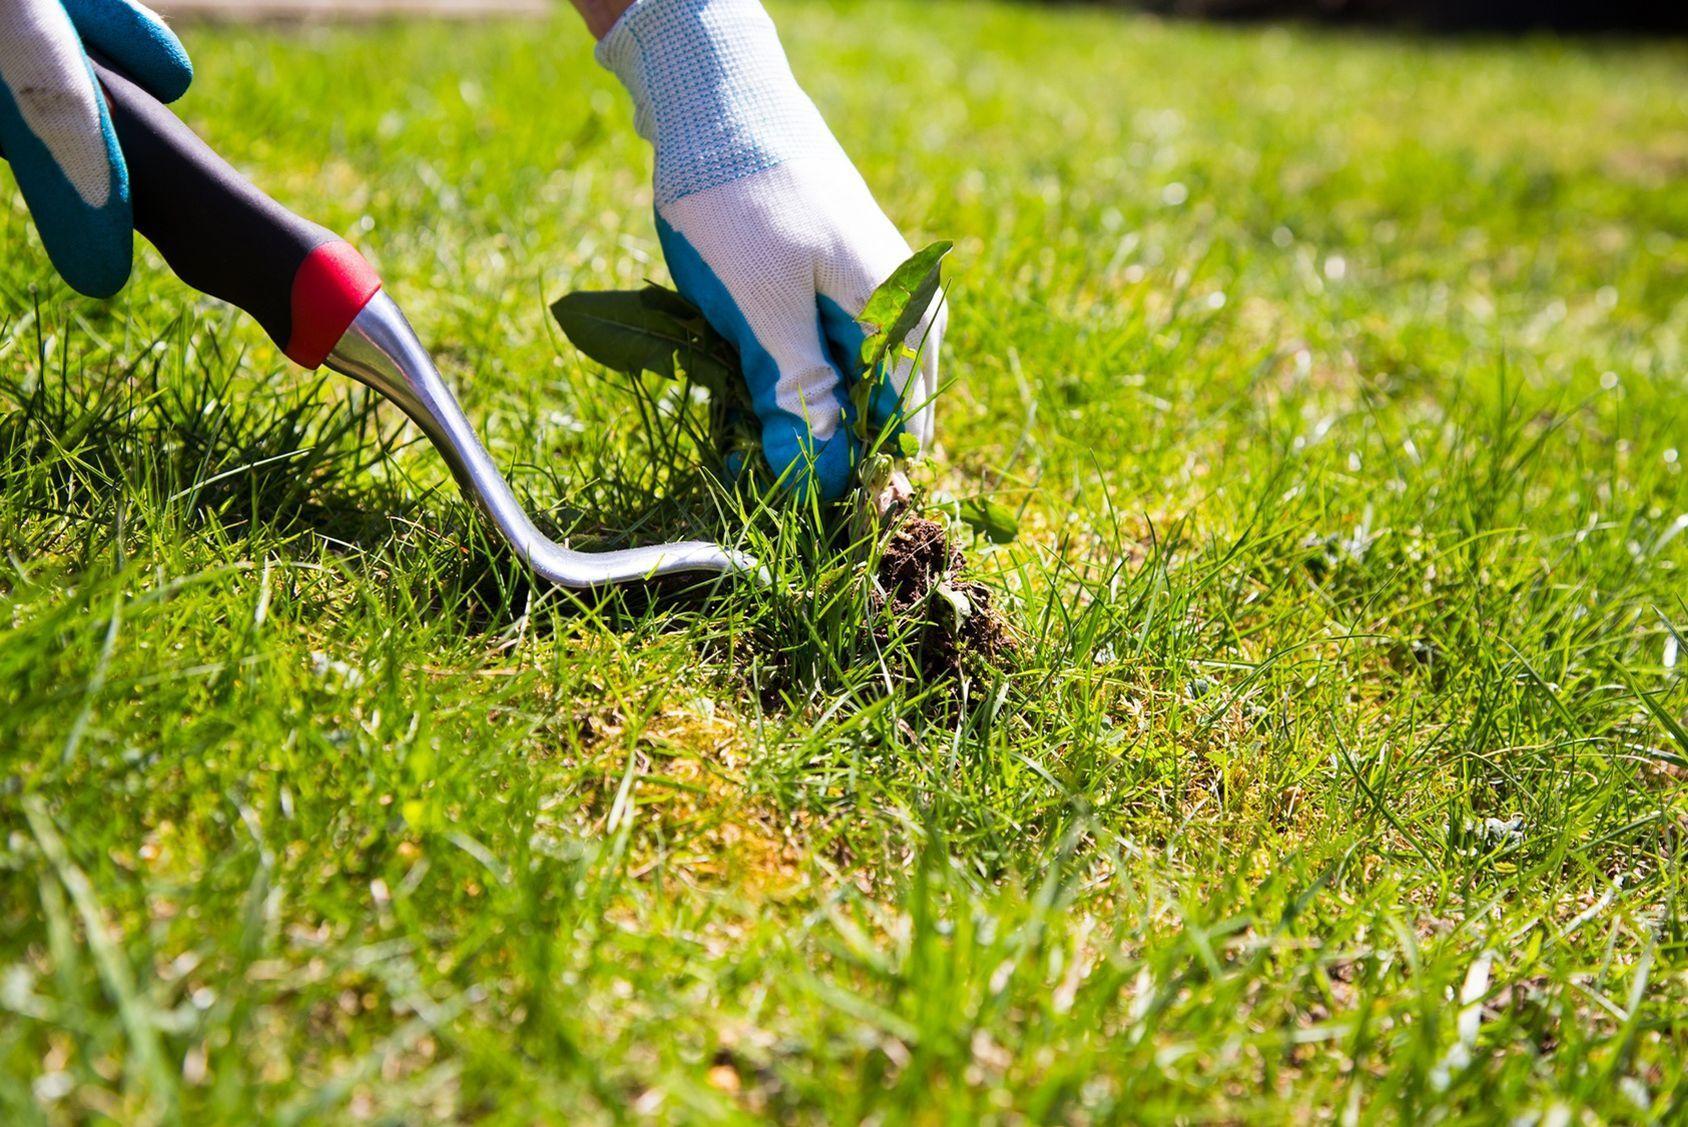 Gazon offrez lui un bon nettoyage de printemps for Nettoyage jardin printemps